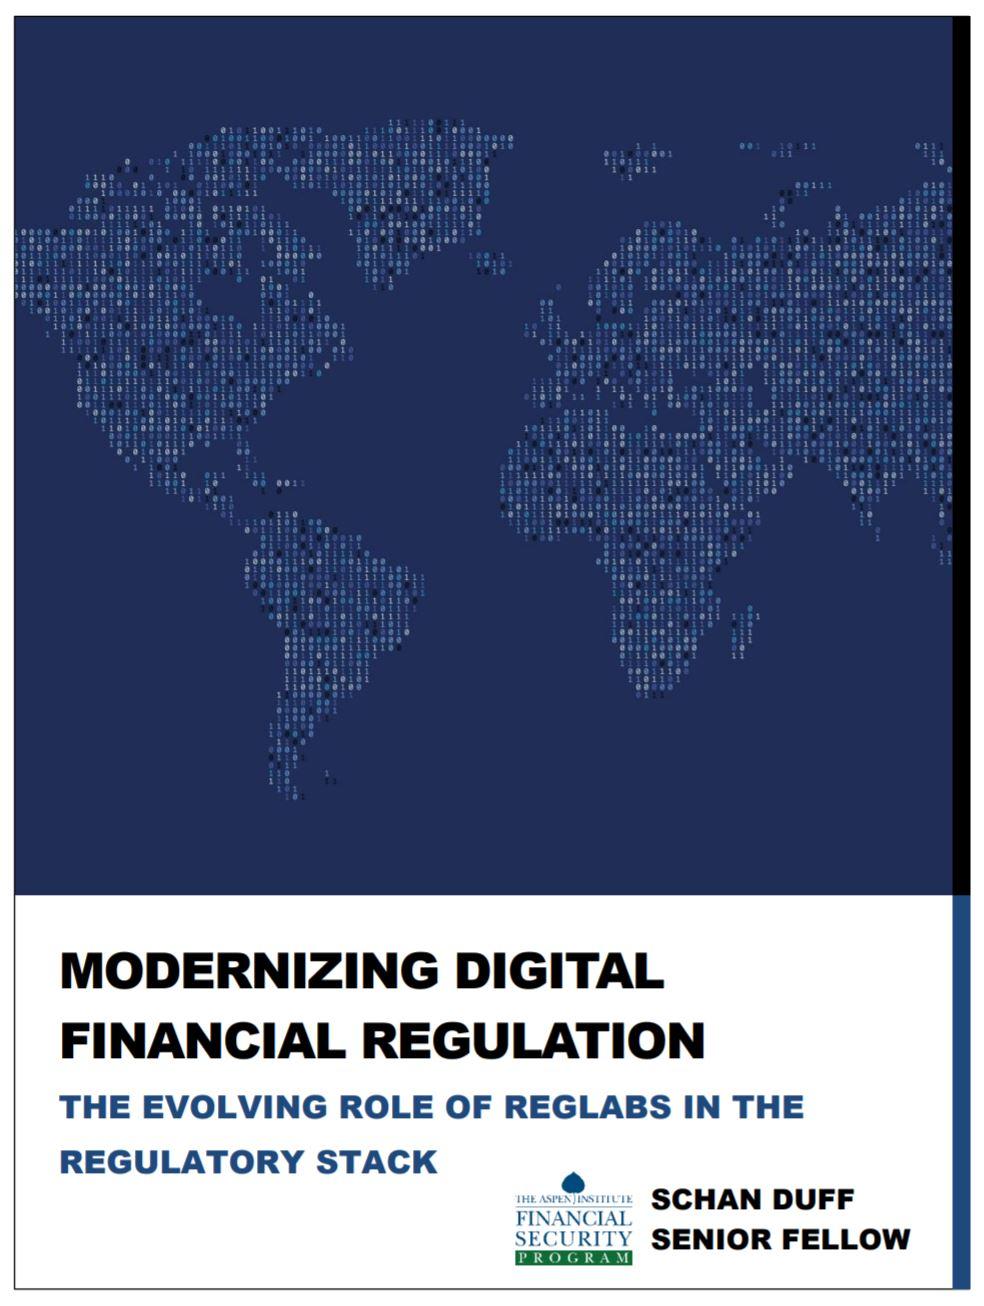 Modernizing Digital Financial Regulation: The Evolving Role of RegLabs in the Regulatory Stack